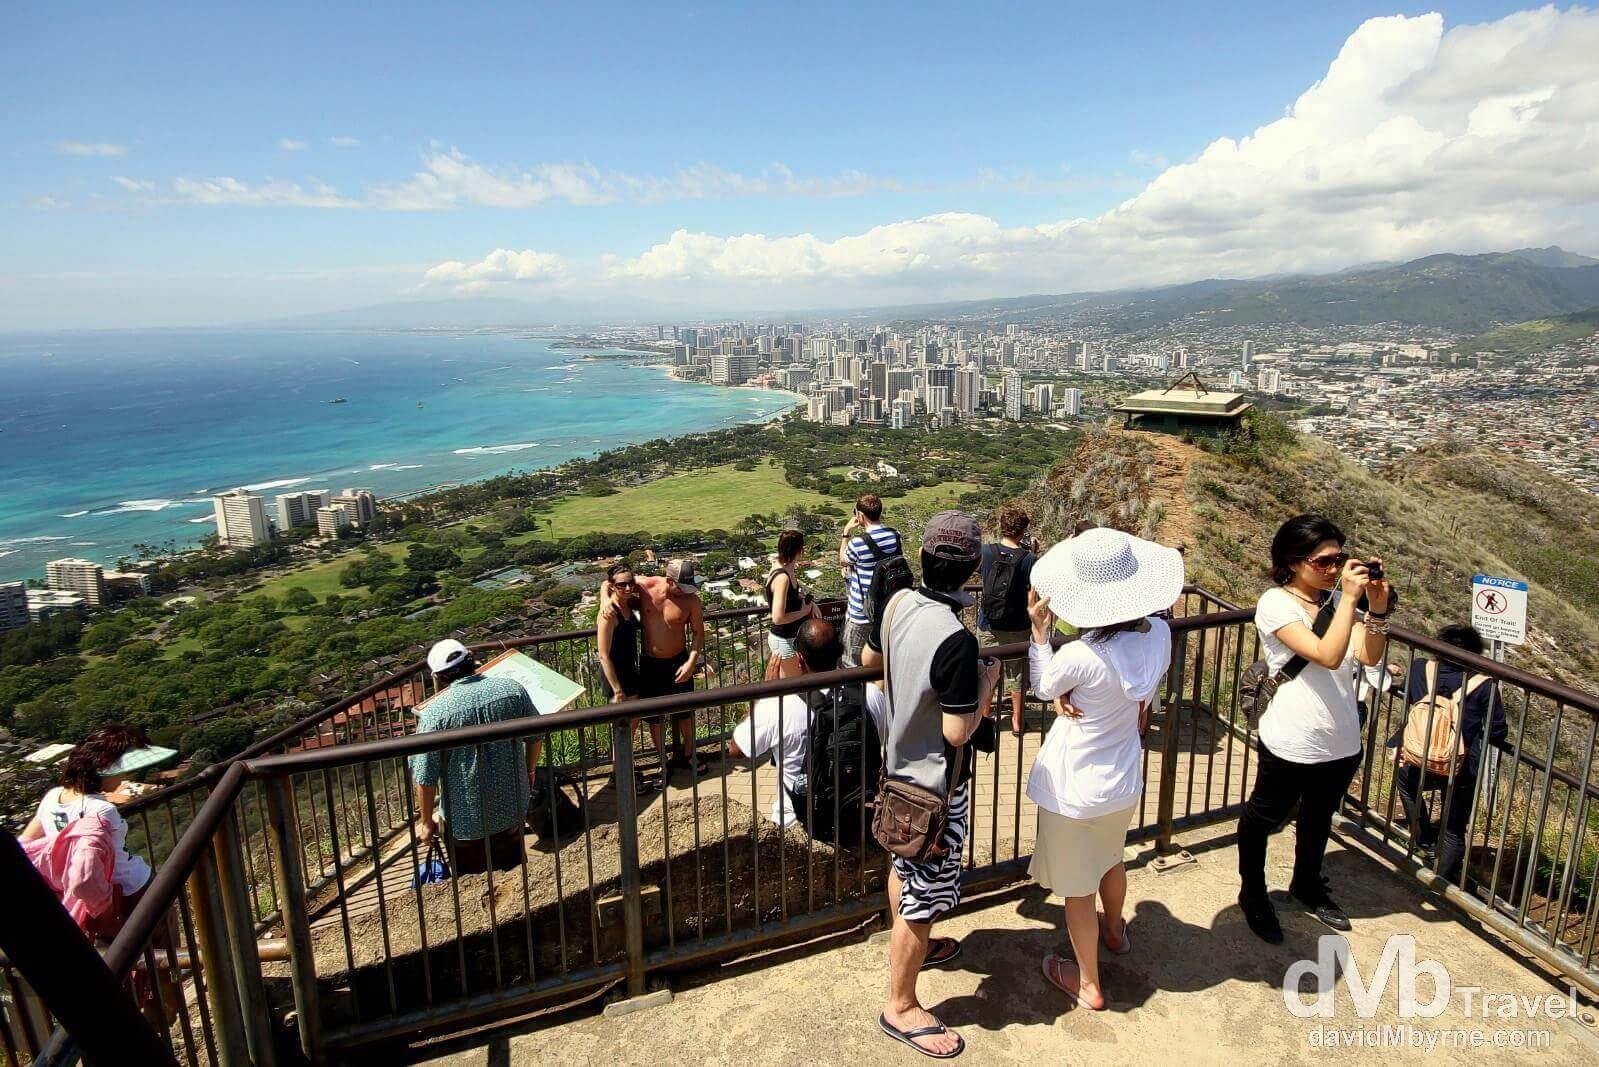 Top of Diamond Head, Oahu, Hawaii.  Best Honolulu-Oahu Attractions - Things to Do in Honolulu-Oahu